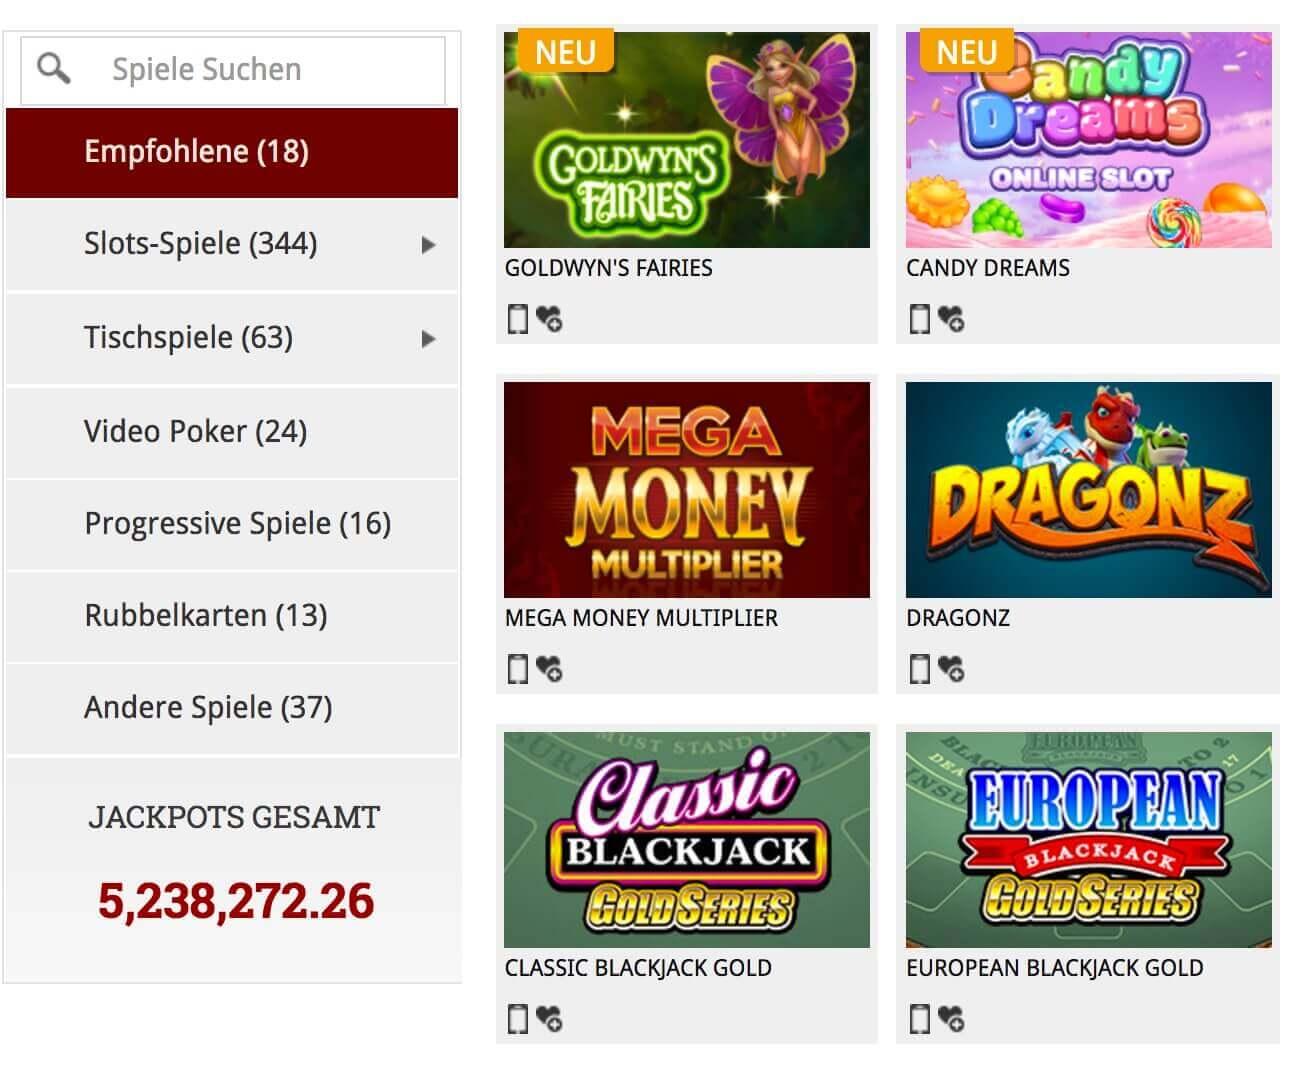 Online Casino 1 Euro Deposit